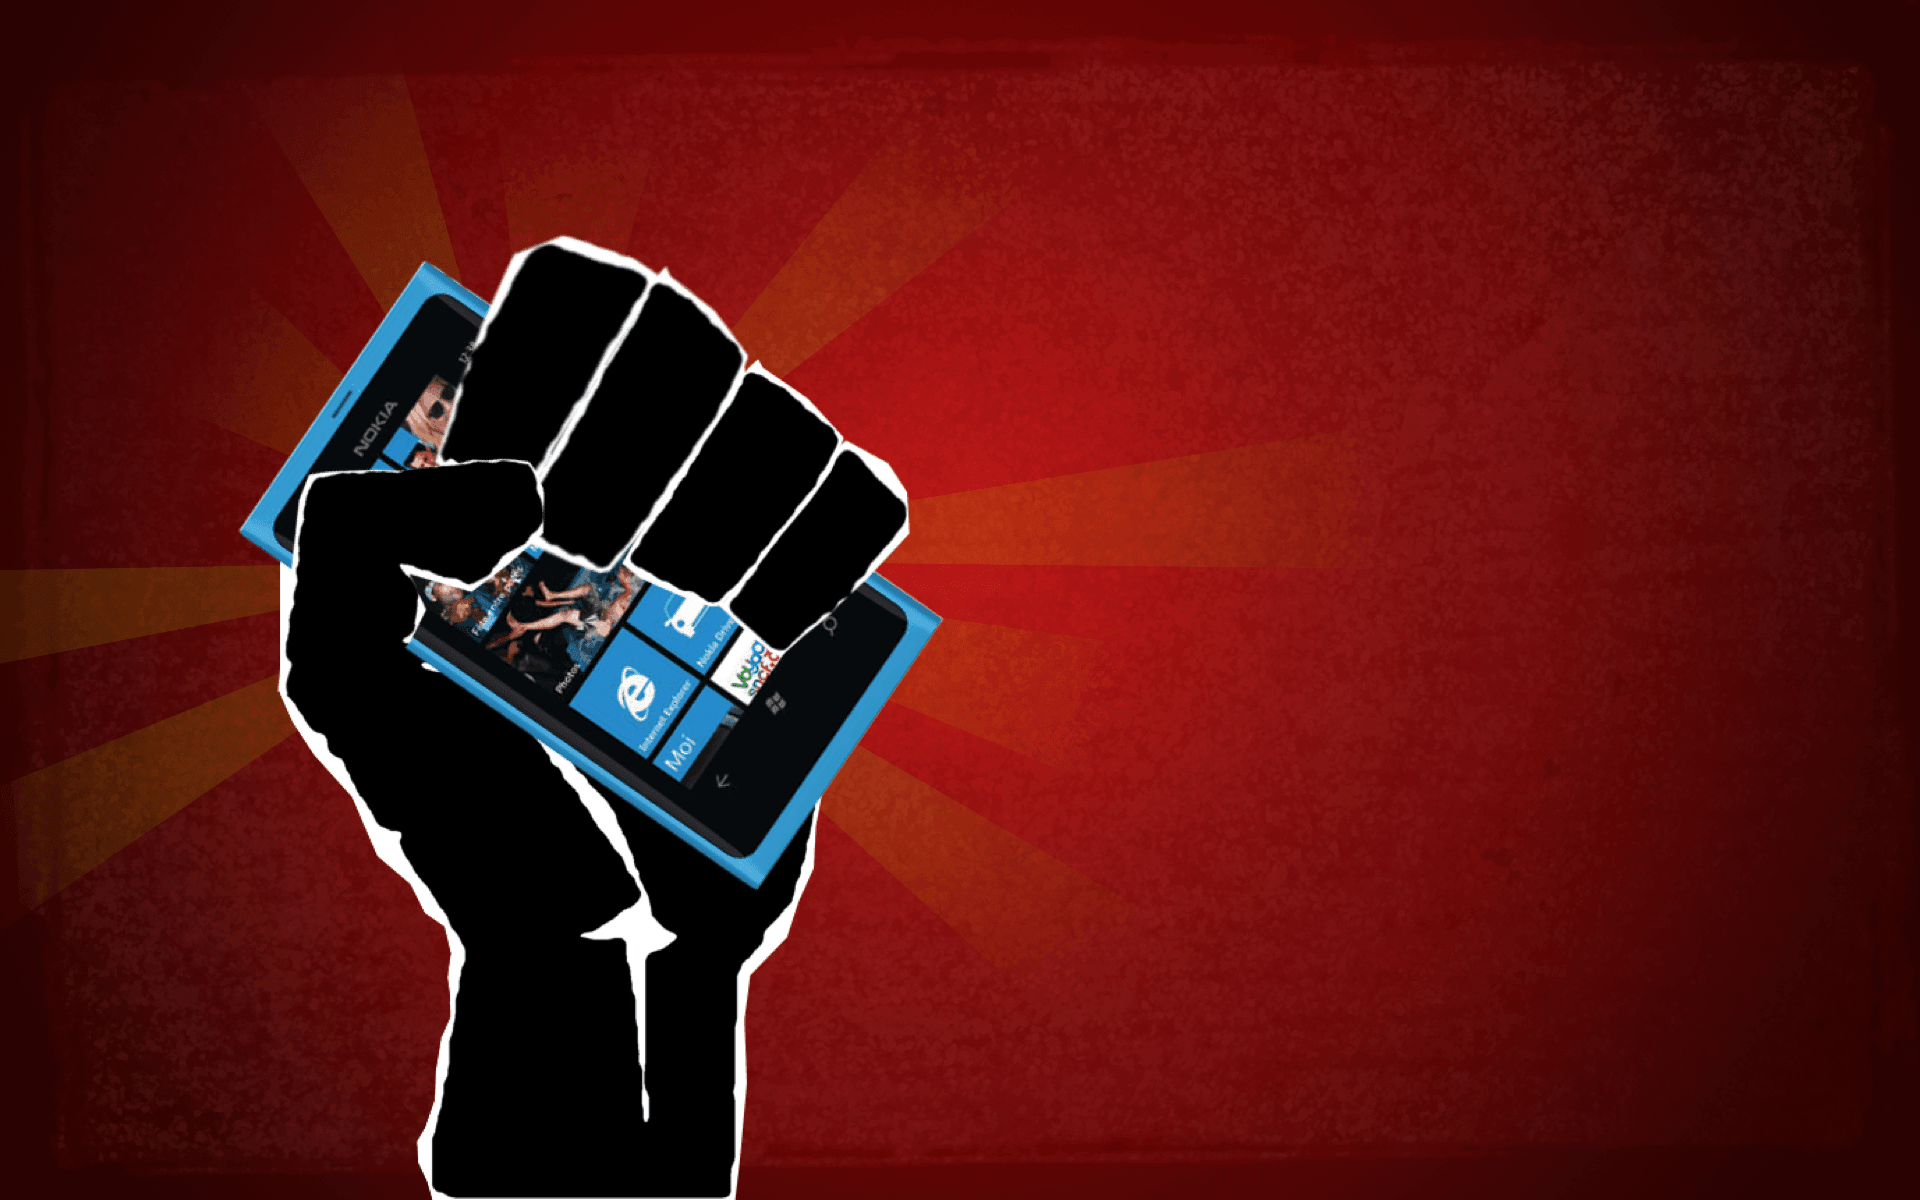 User-Centered Design for Mobile - Guerrilla Style!